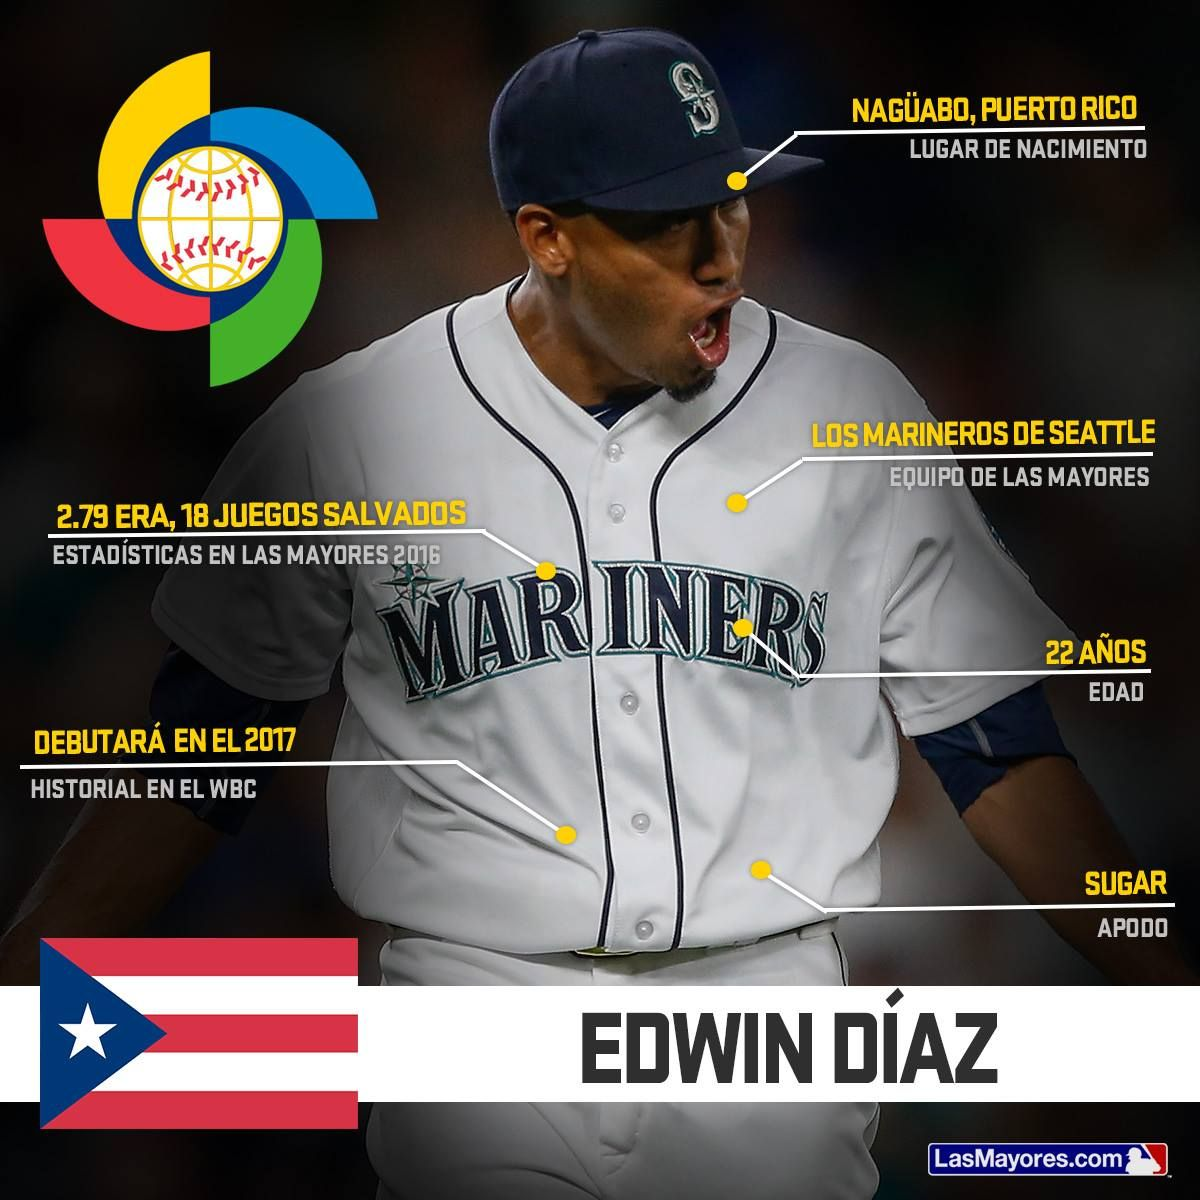 Edwin Diaz Puerto Rico World Baseball Classic 2017 Puerto Rico